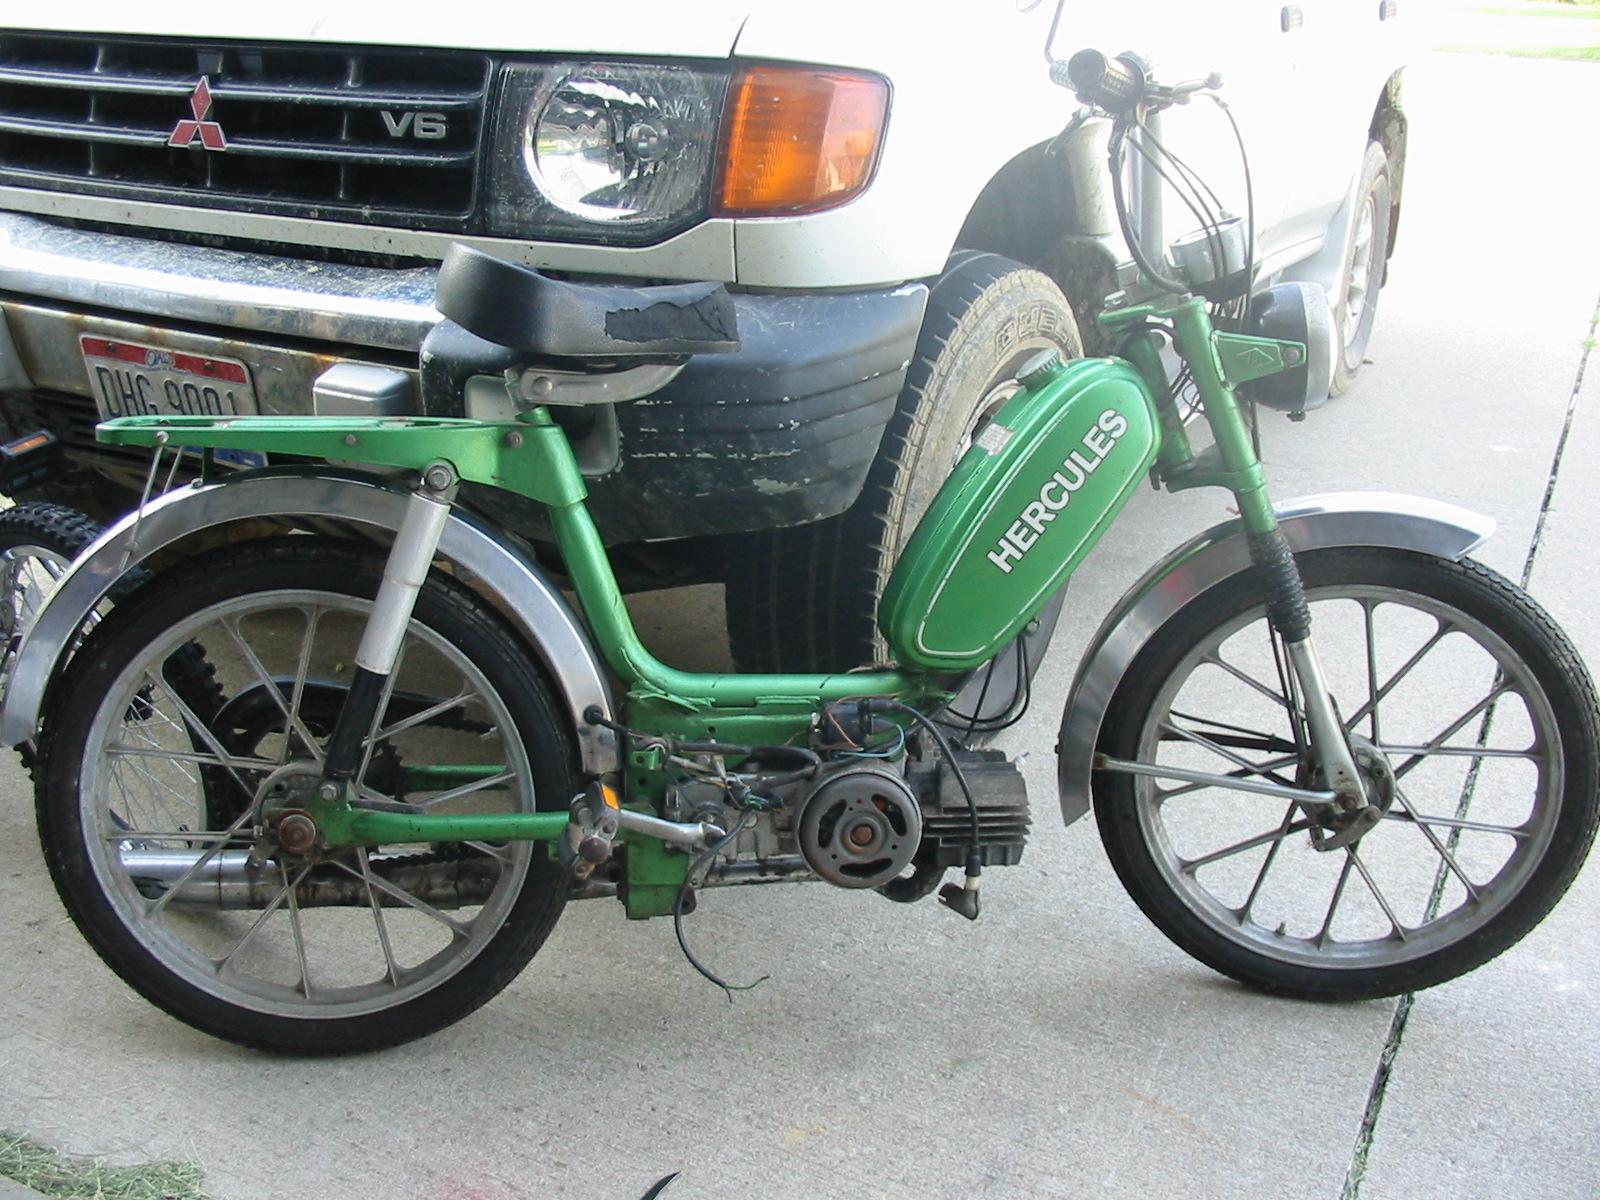 sachs suburban wiring diagram — moped army on royal ryder wiring diagram,